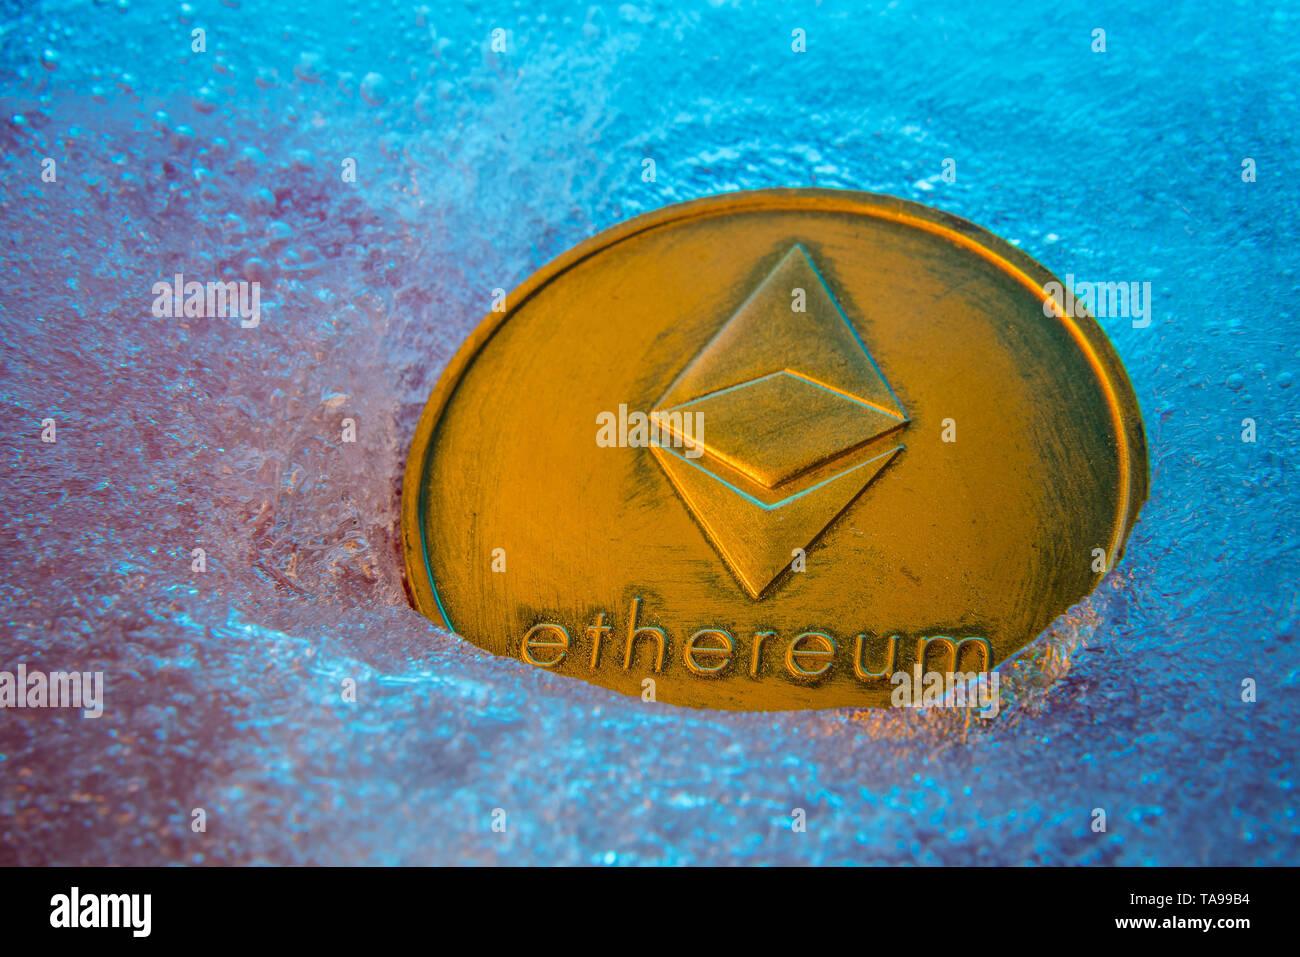 Golden Ethereum coin, online digital currency frozen in the blue ice. Concept of block chain, market crash. Frozen crypto money, depreciation - Stock Image